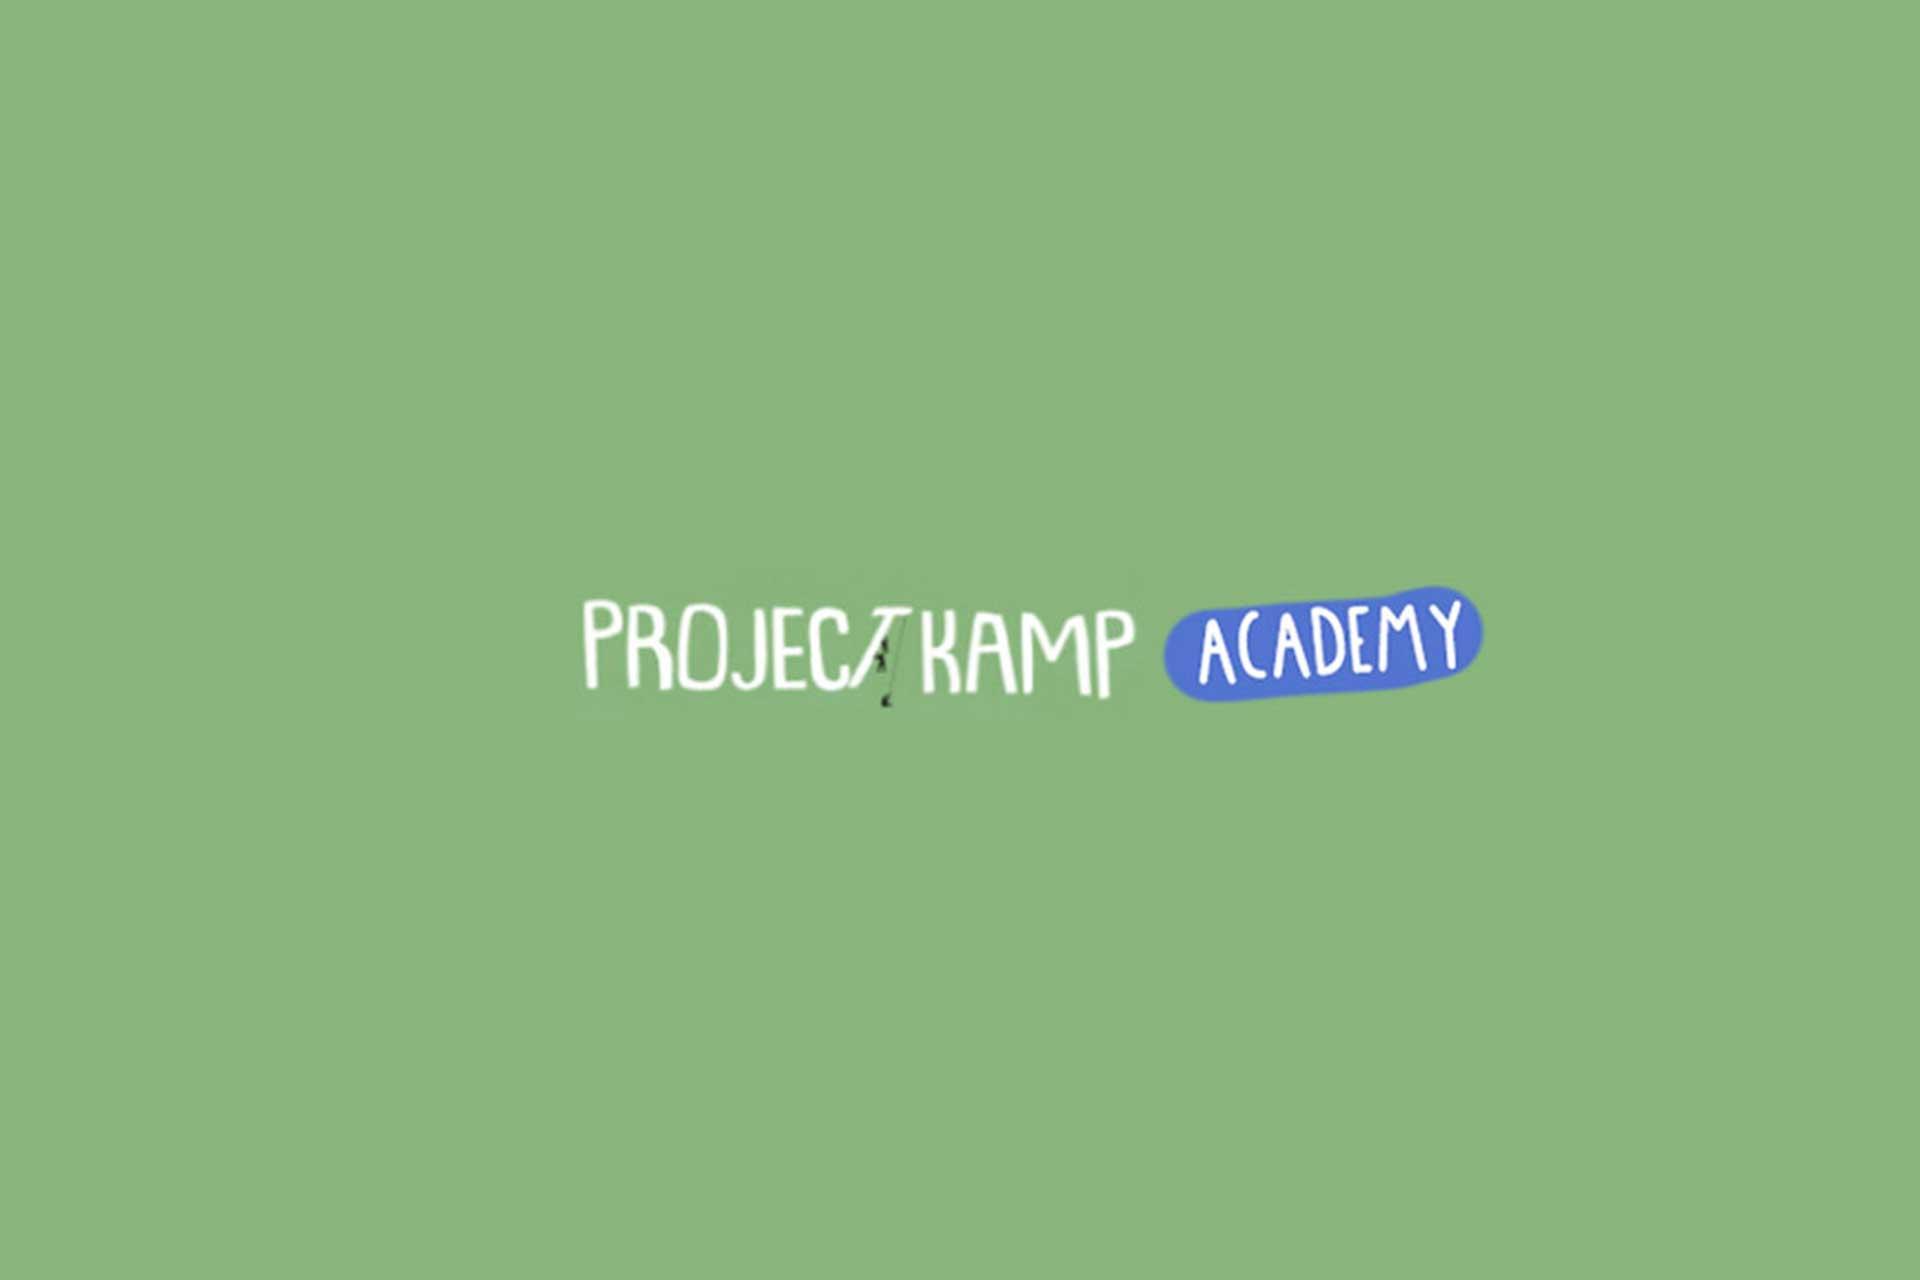 Project Kamp Academy Illustration